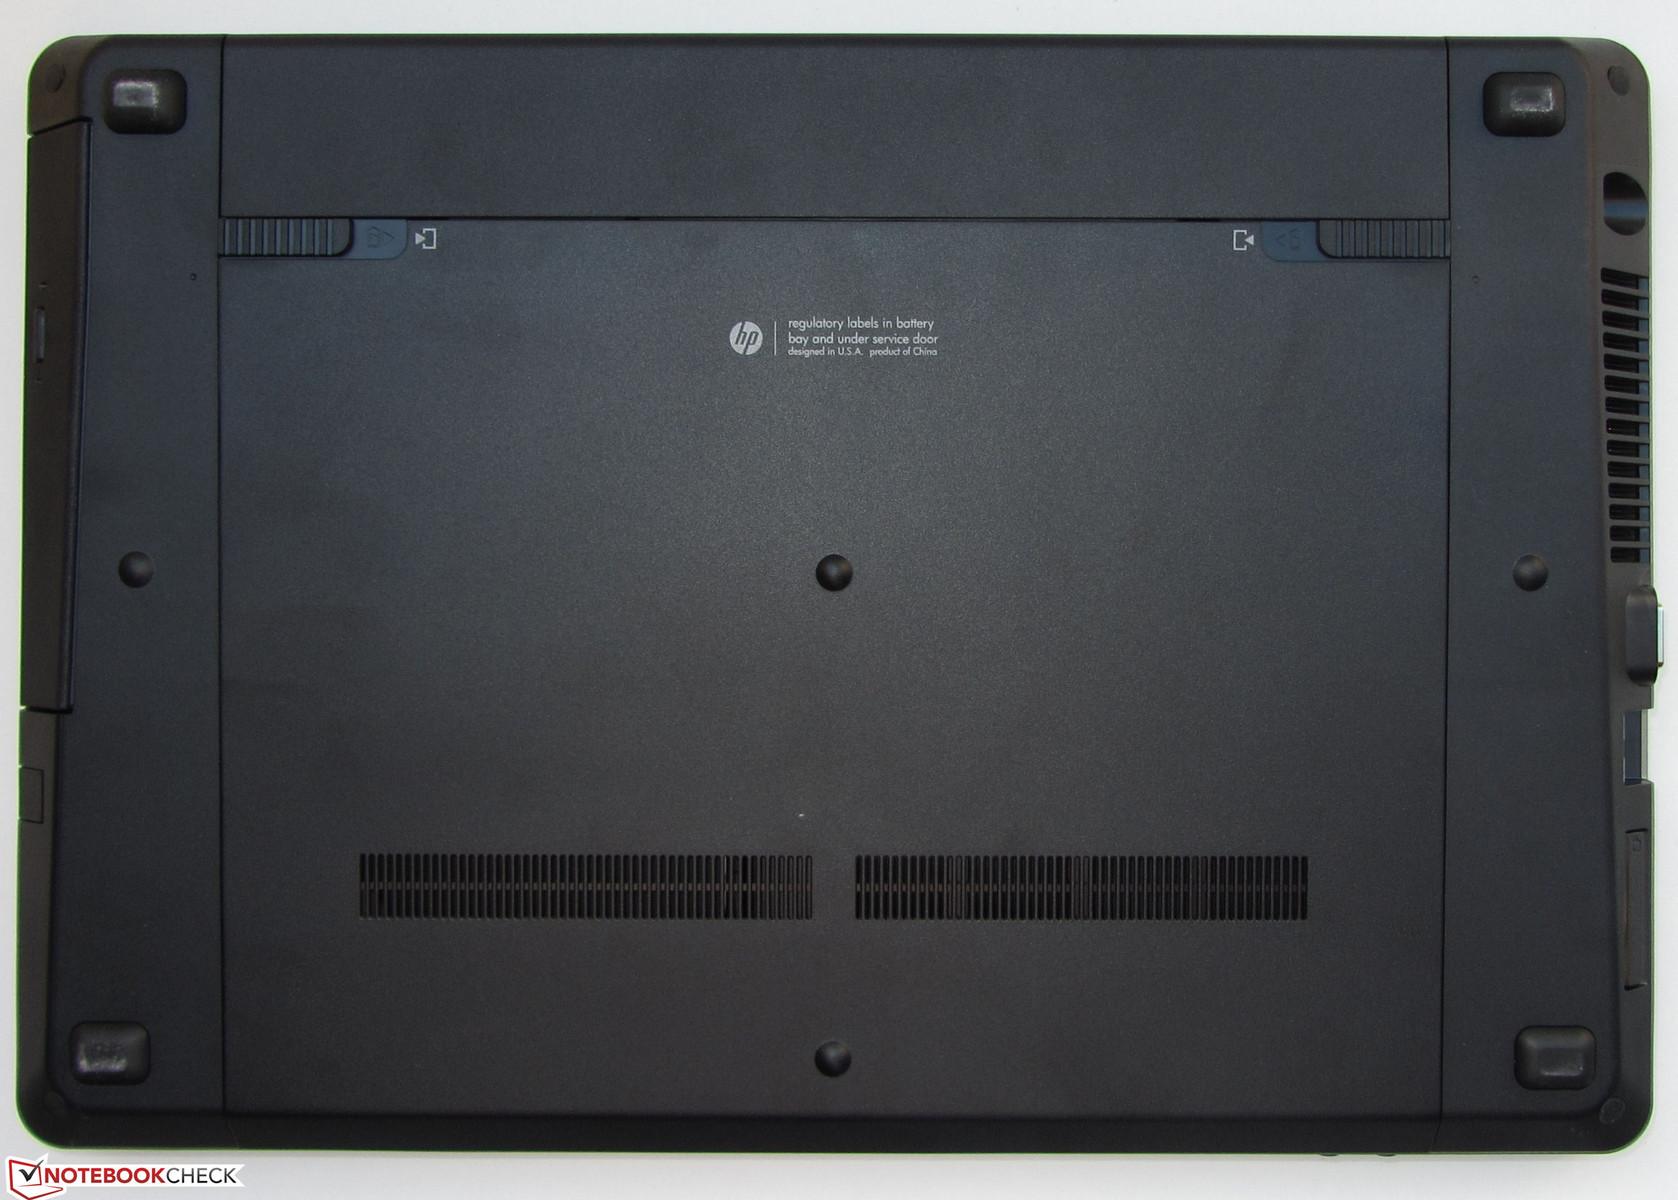 HP PROBOOK 4530S WIRELESS WINDOWS VISTA DRIVER DOWNLOAD